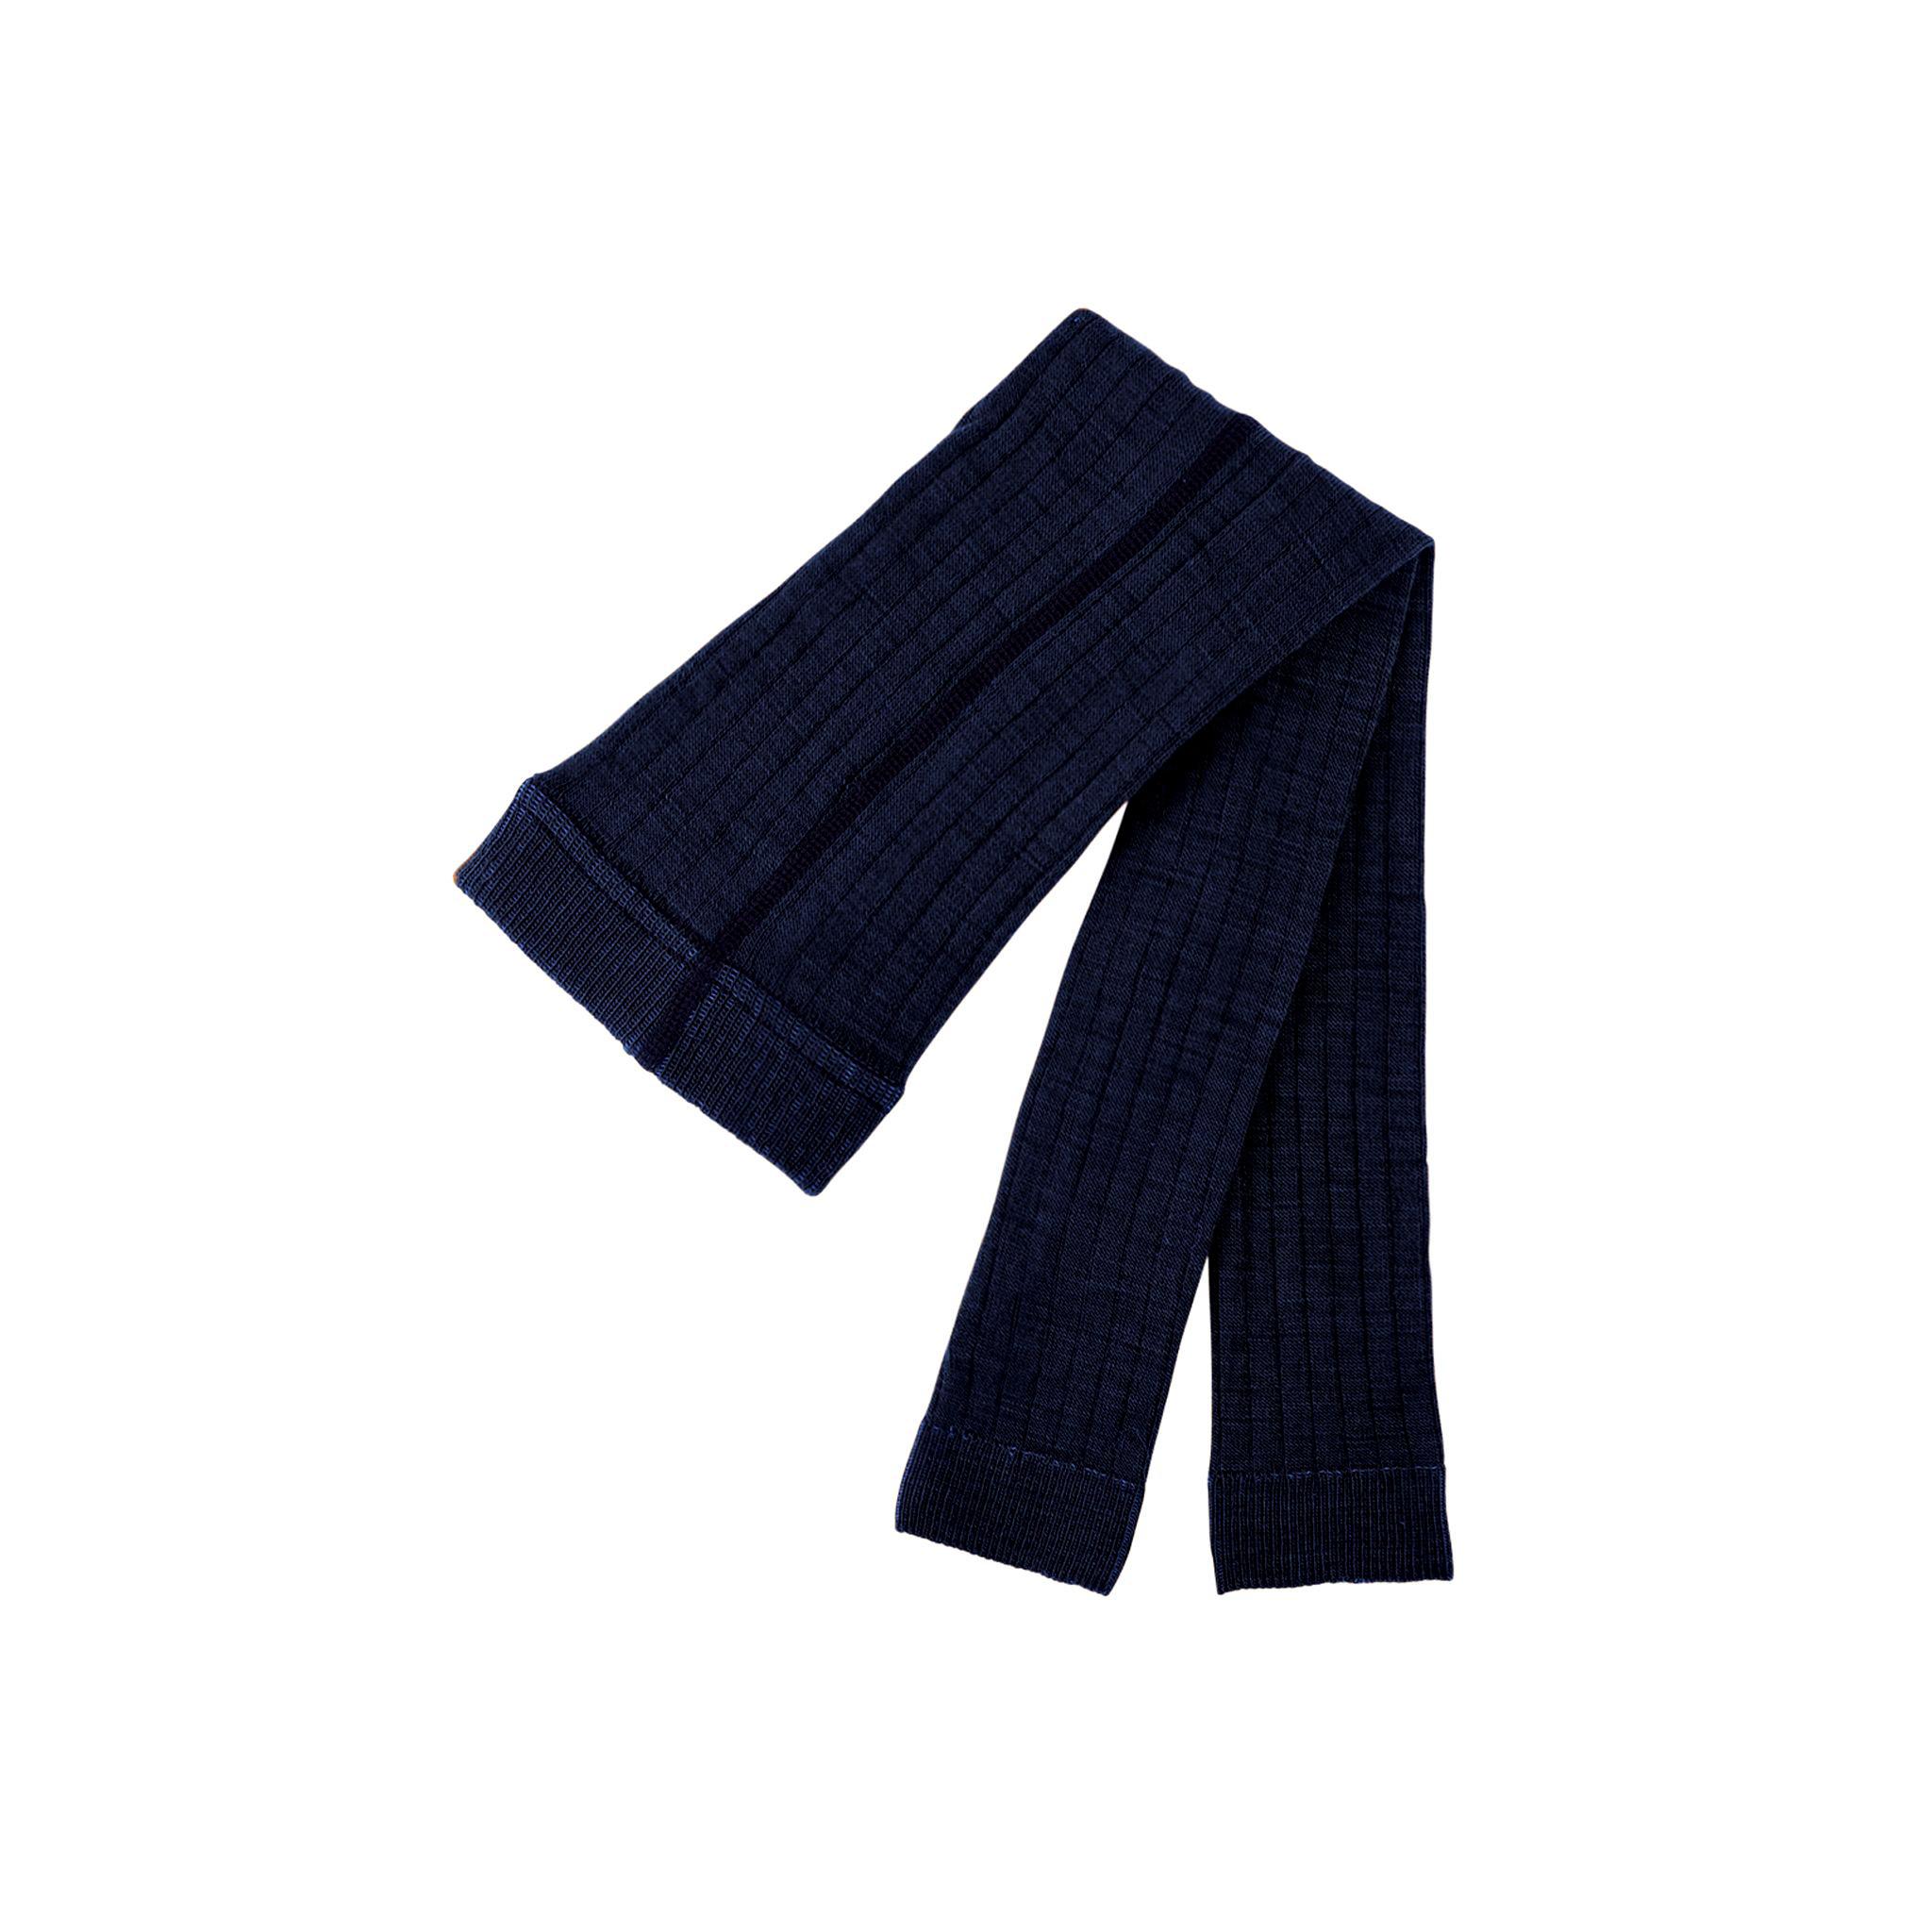 Pure Pure Woll-Leggings marine, innen Baumwolle